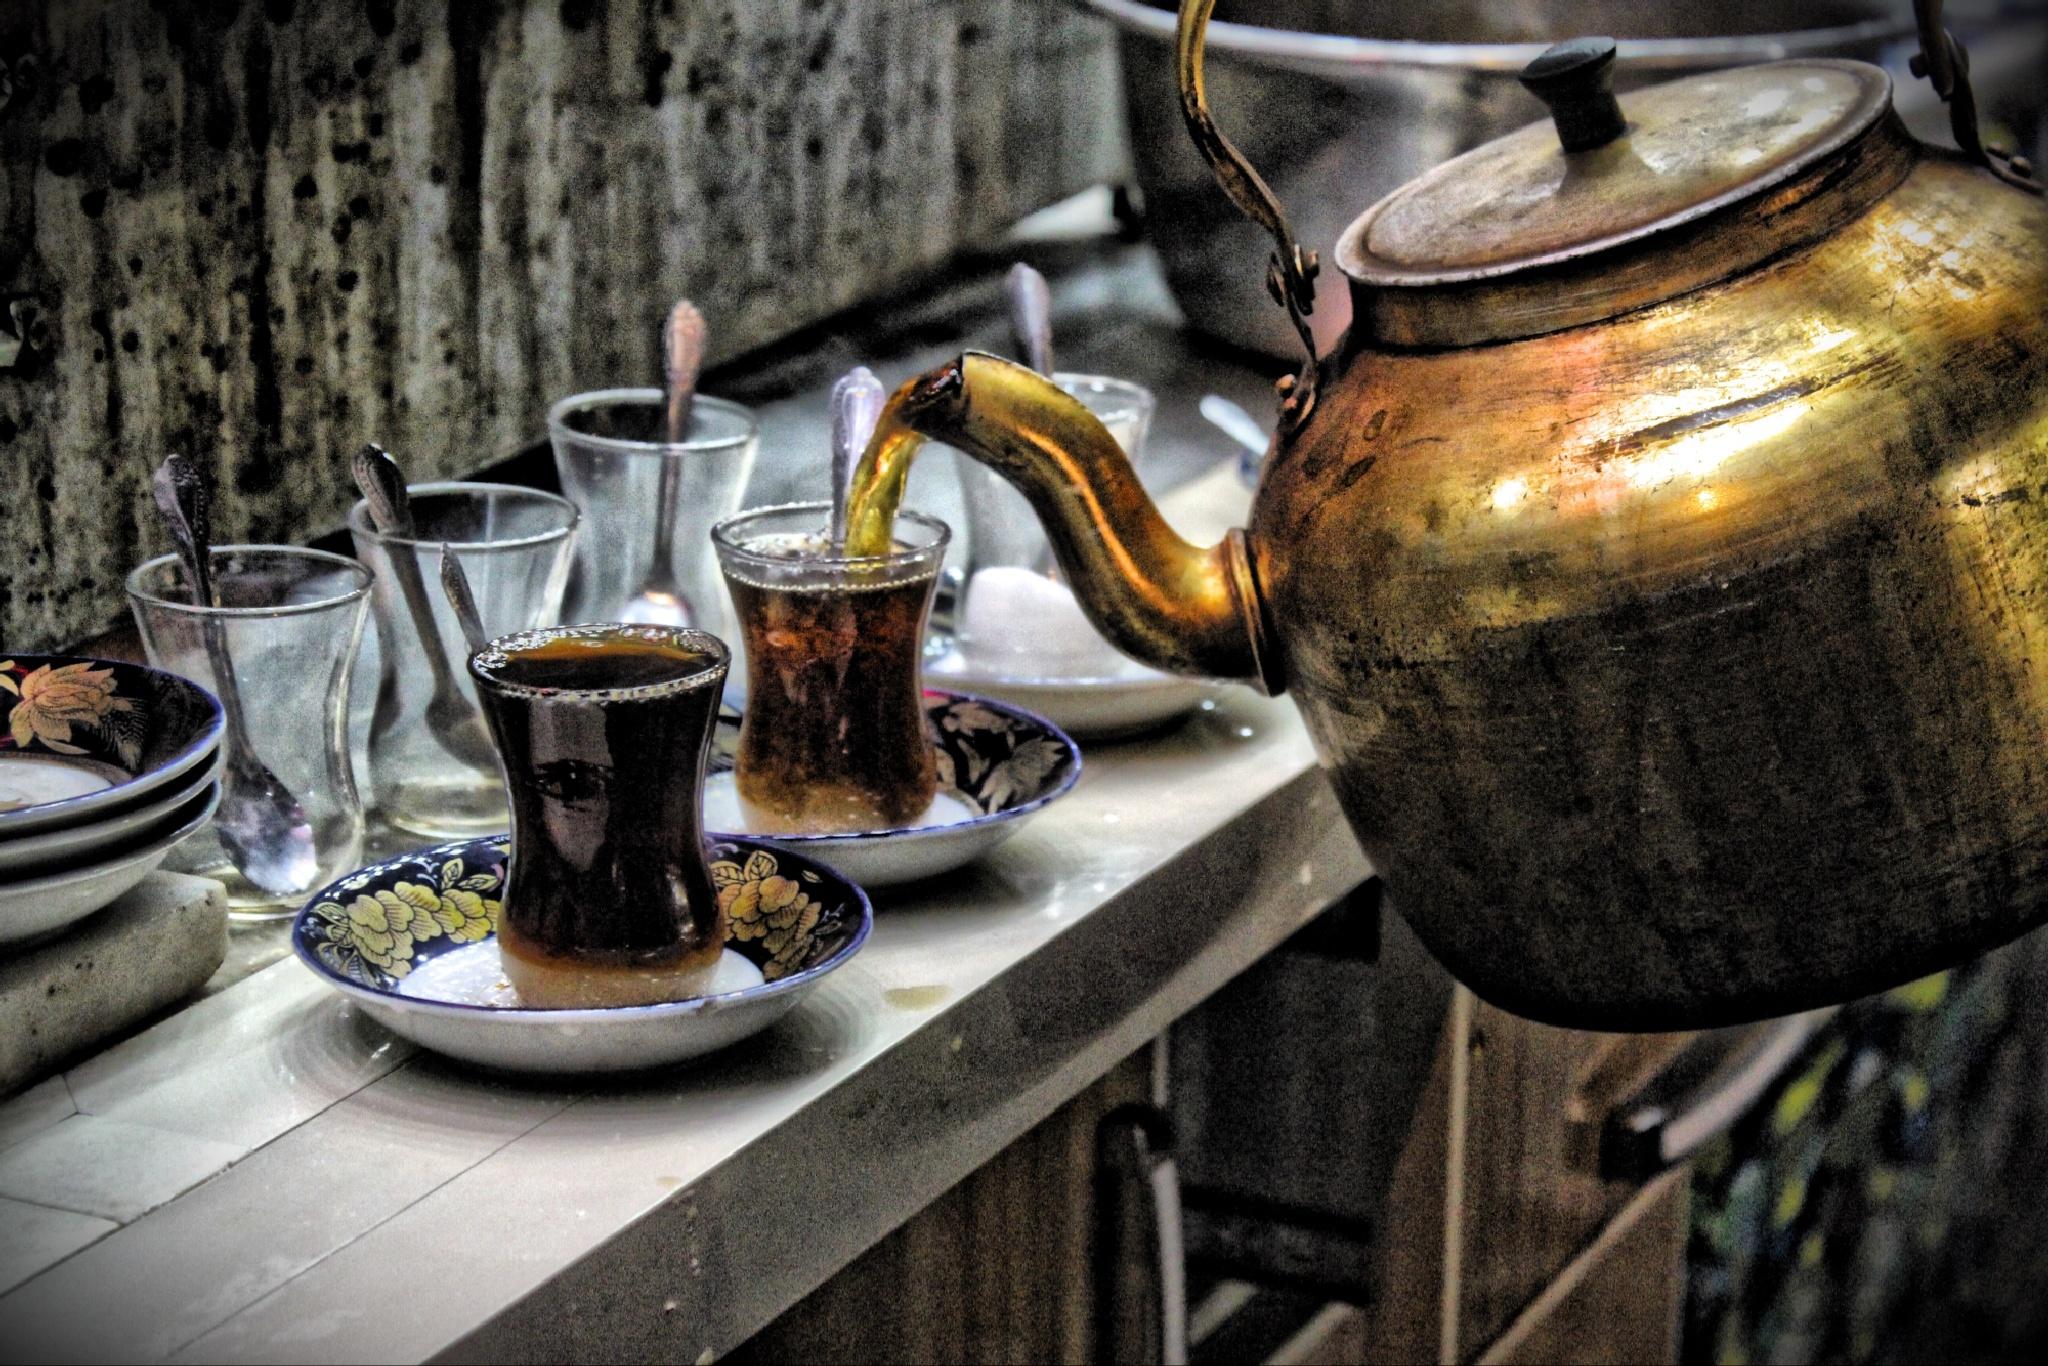 Tea Karbala by AymanAlwaeli